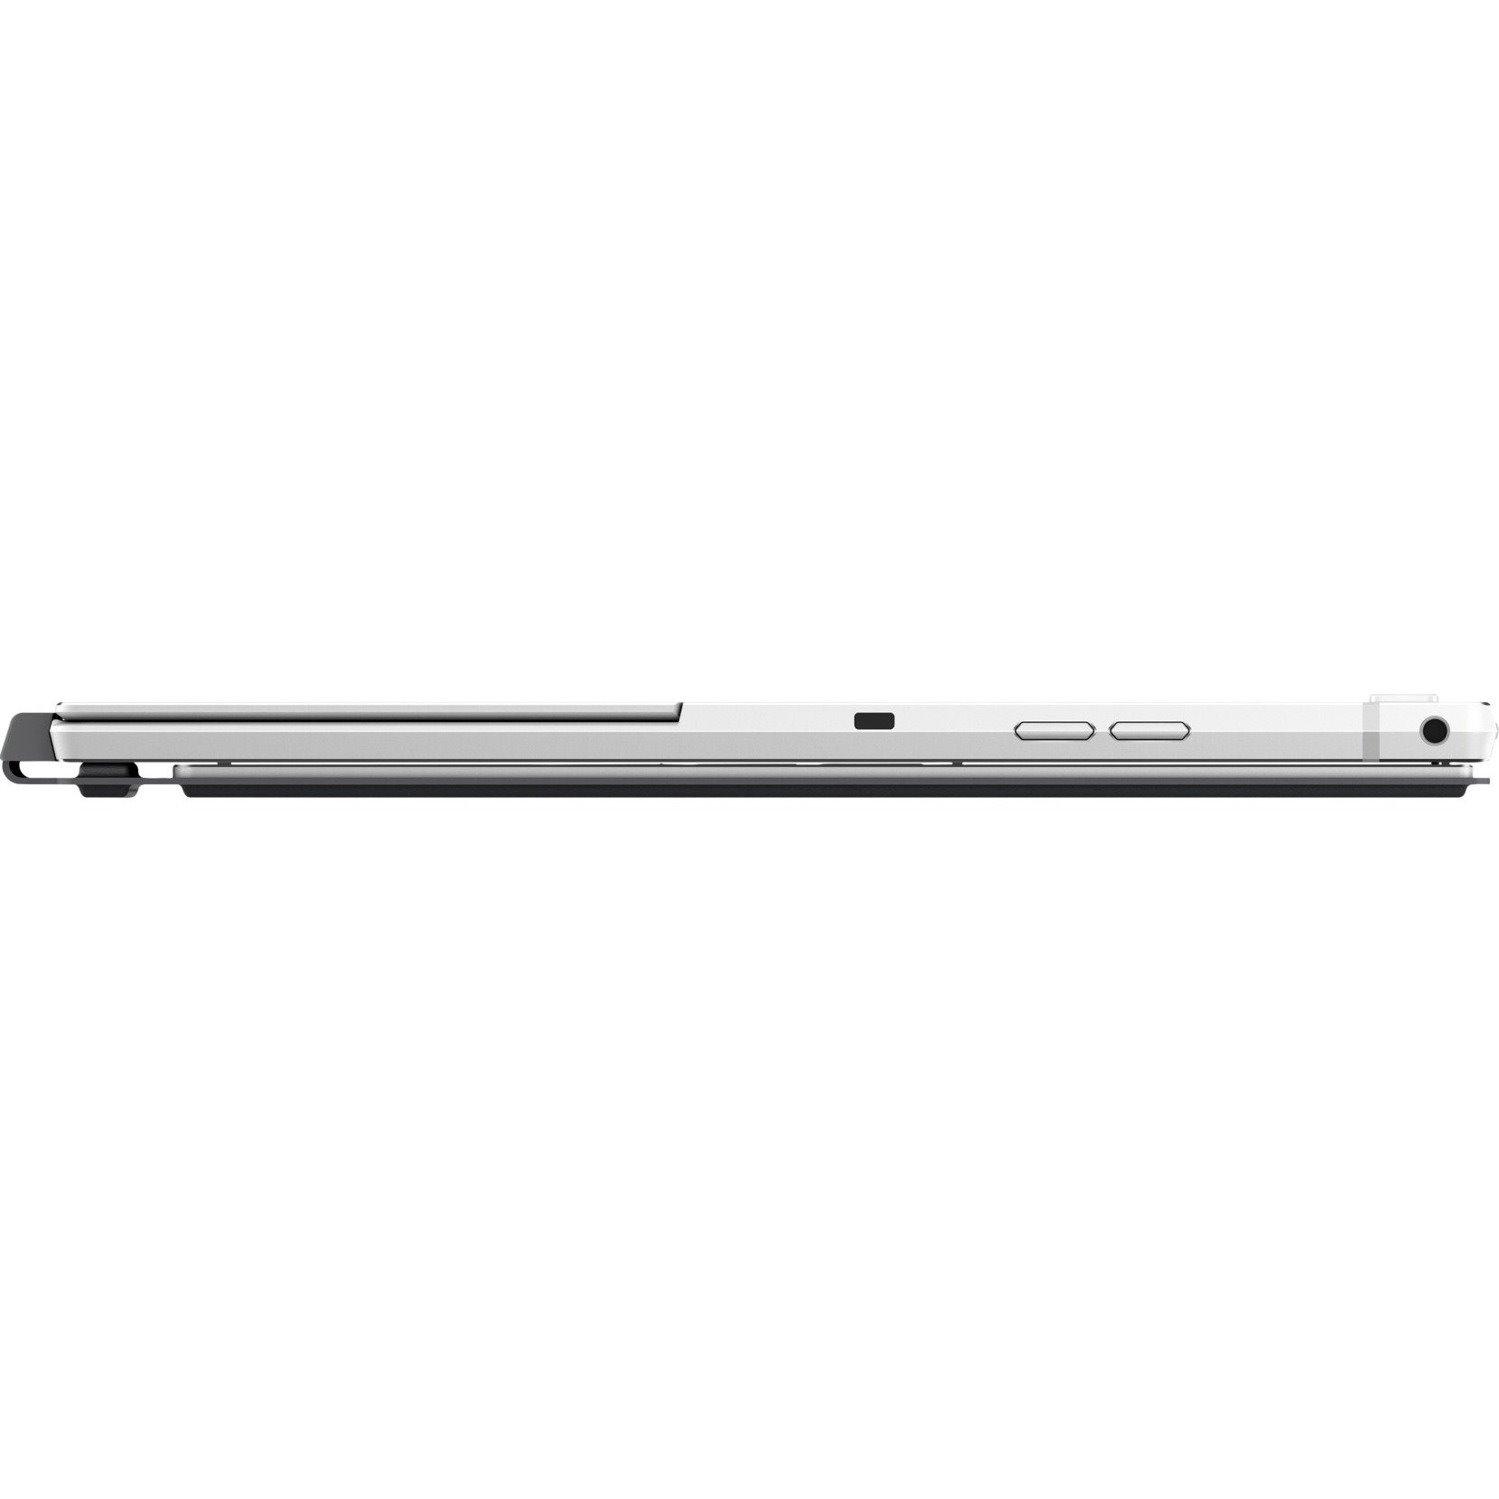 "HP Elite x2 G4 33 cm (13"") Touchscreen 2 in 1 Notebook - 3000 x 2000 - Intel Core i7 (8th Gen) i7-8665U Quad-core (4 Core) 1.90 GHz - 16 GB RAM - 512 GB SSD"